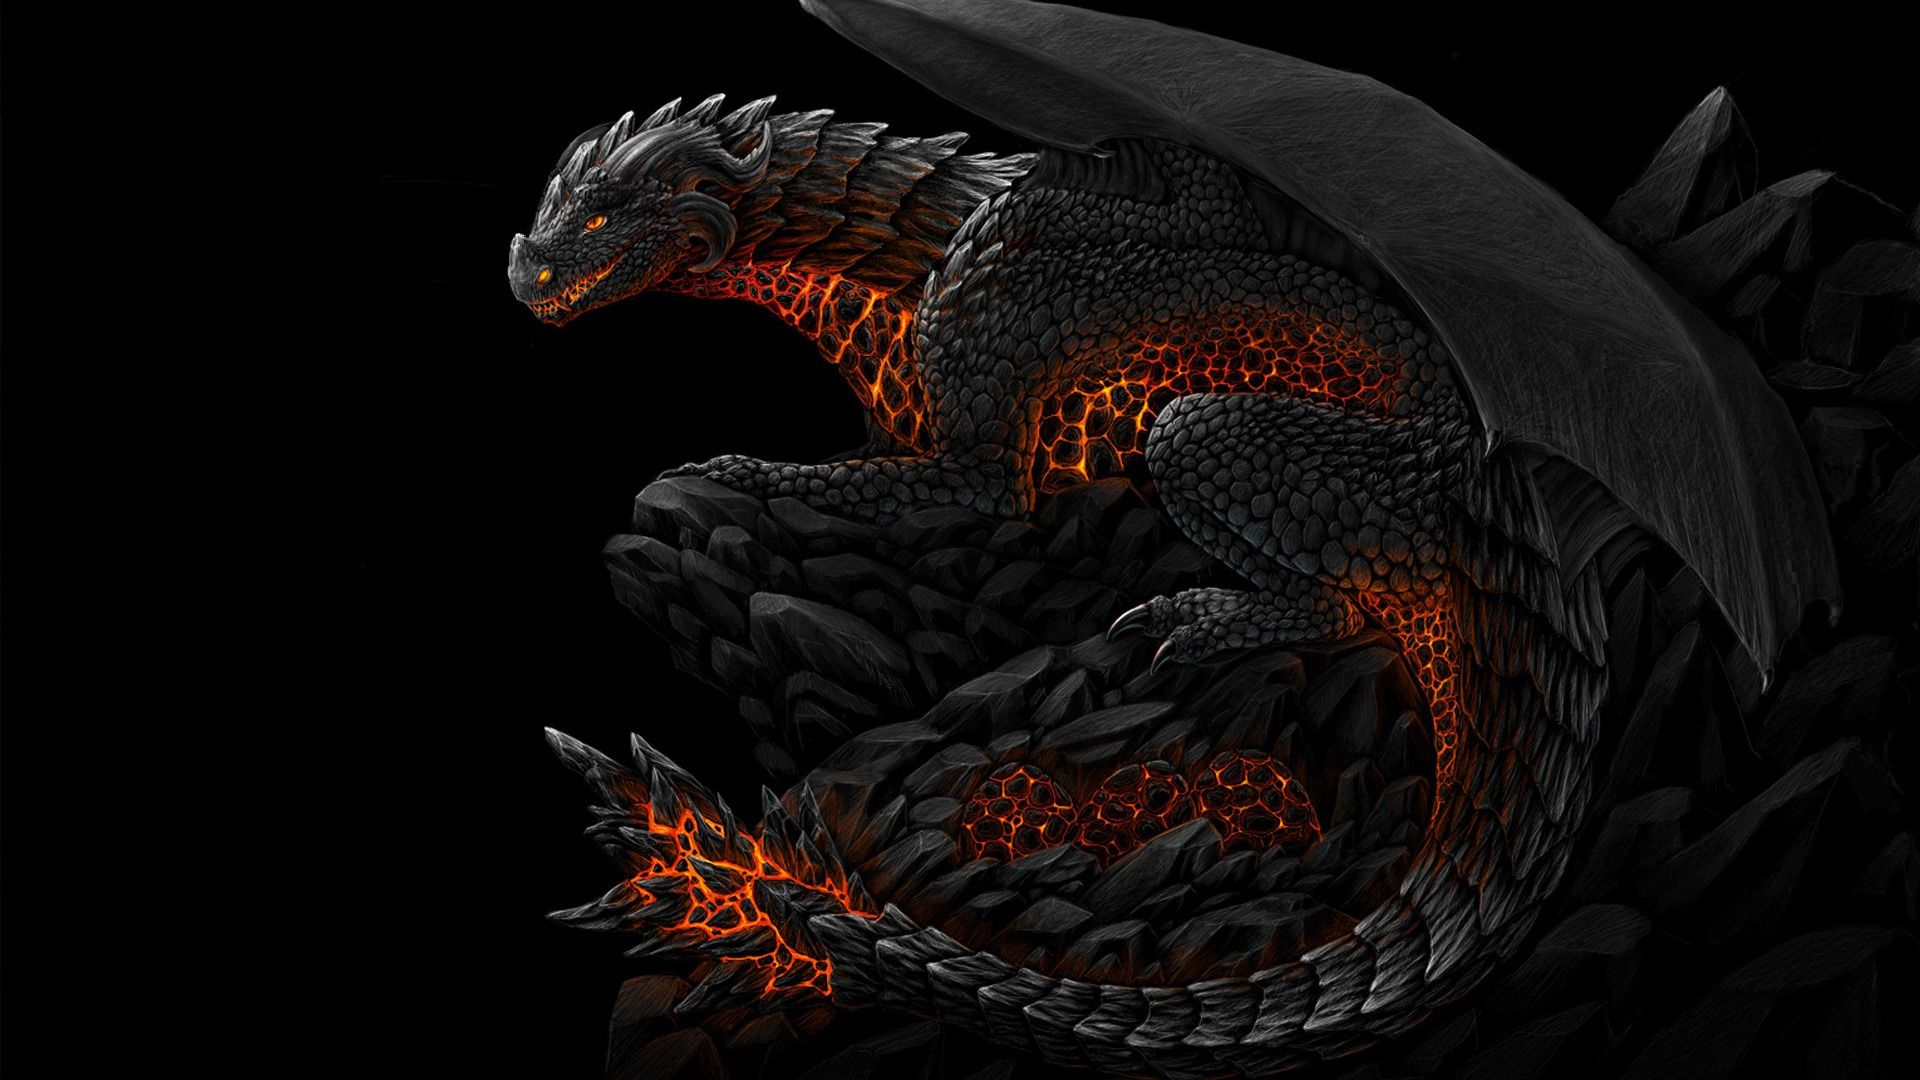 Dark Dragon DArk Dragon Fire Wallpaper With Resolutions